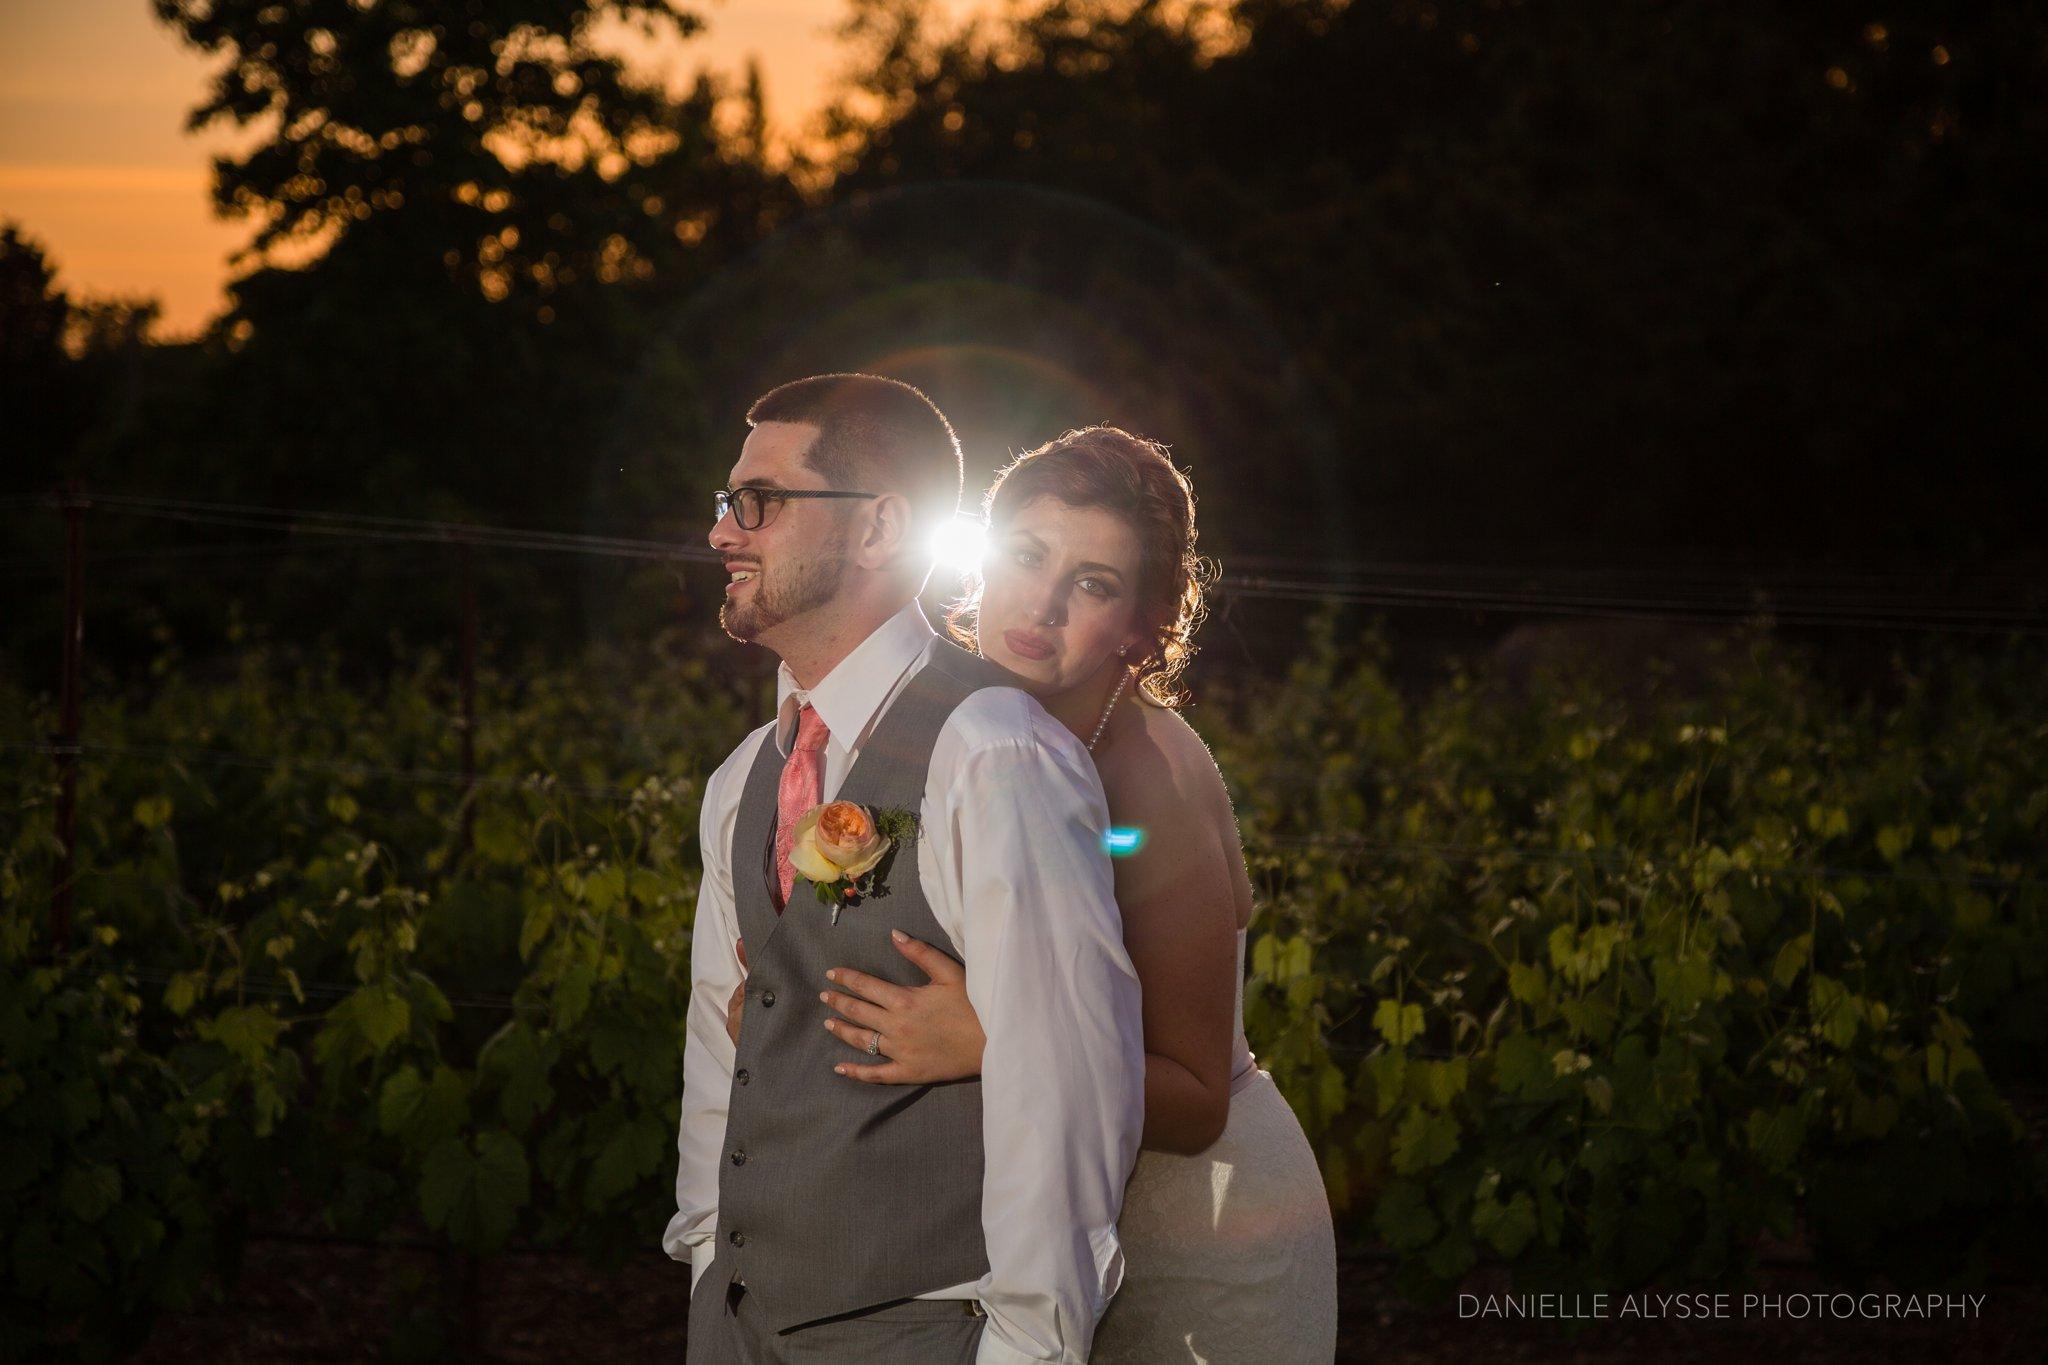 170507_blog_megan_david_wedding_loomis_flower_farm_inn_danielle_alysse_photography_sacramento_photographer0416_WEB.jpg